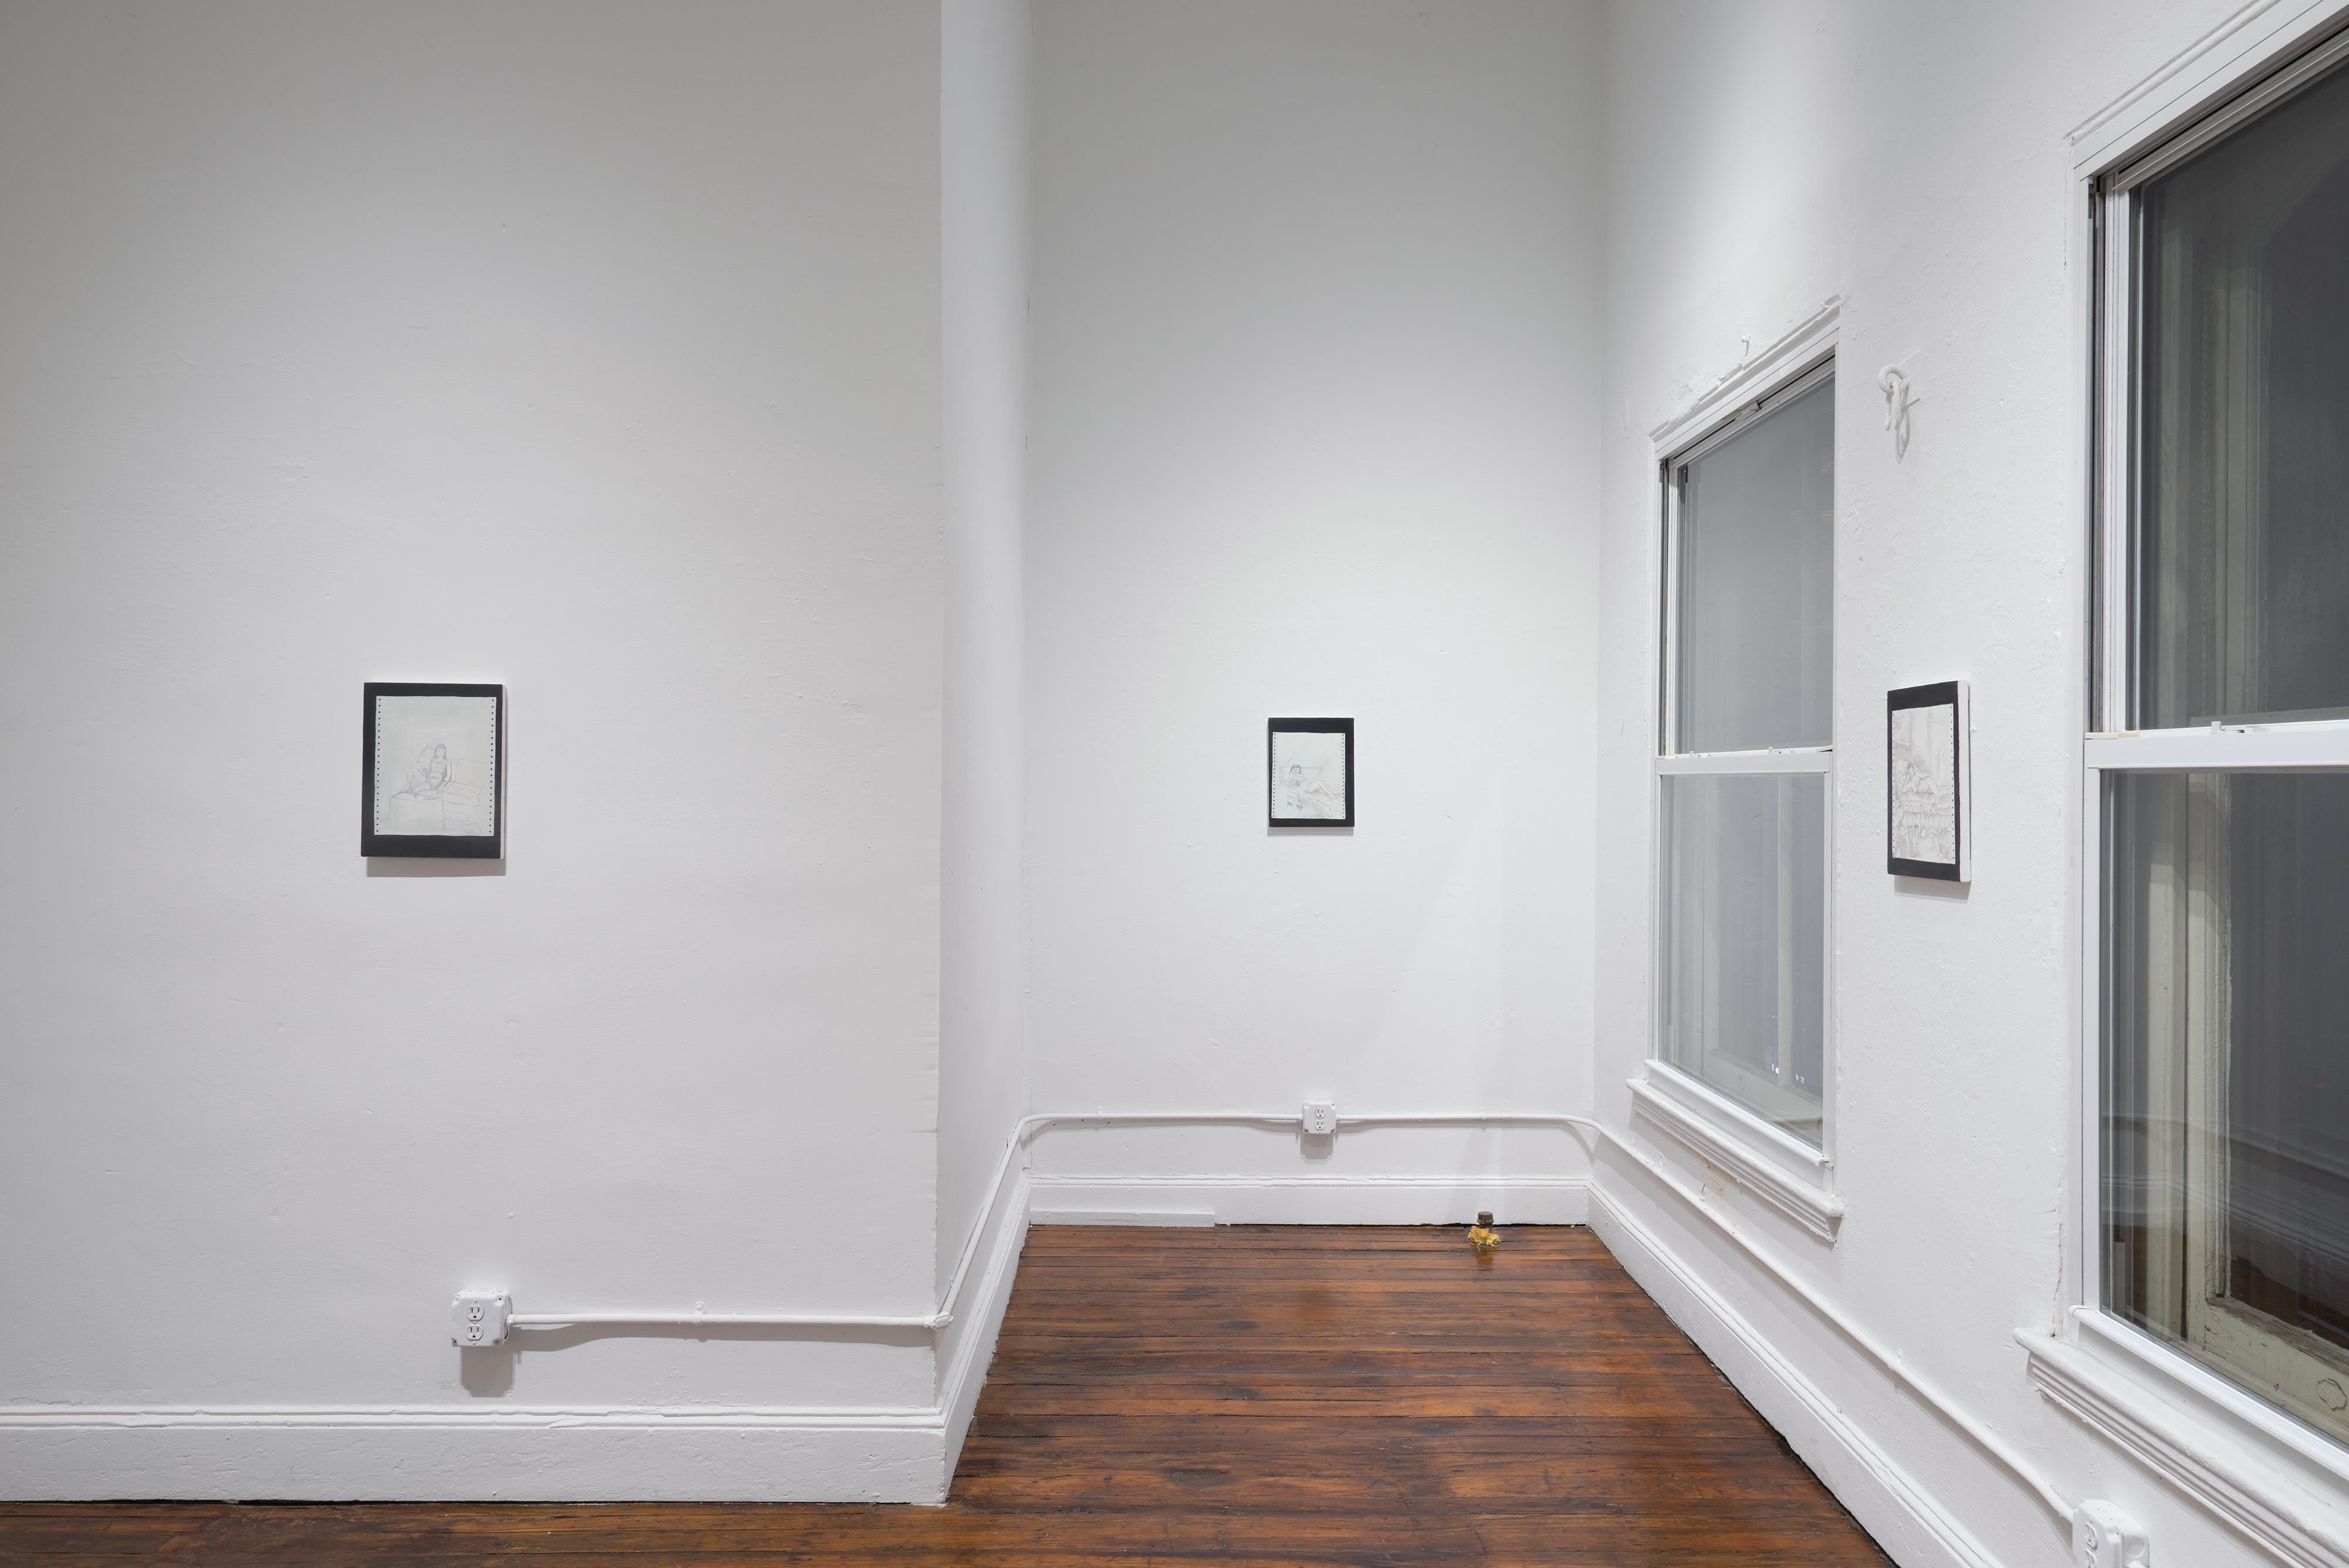 Imaginary Friend installation view